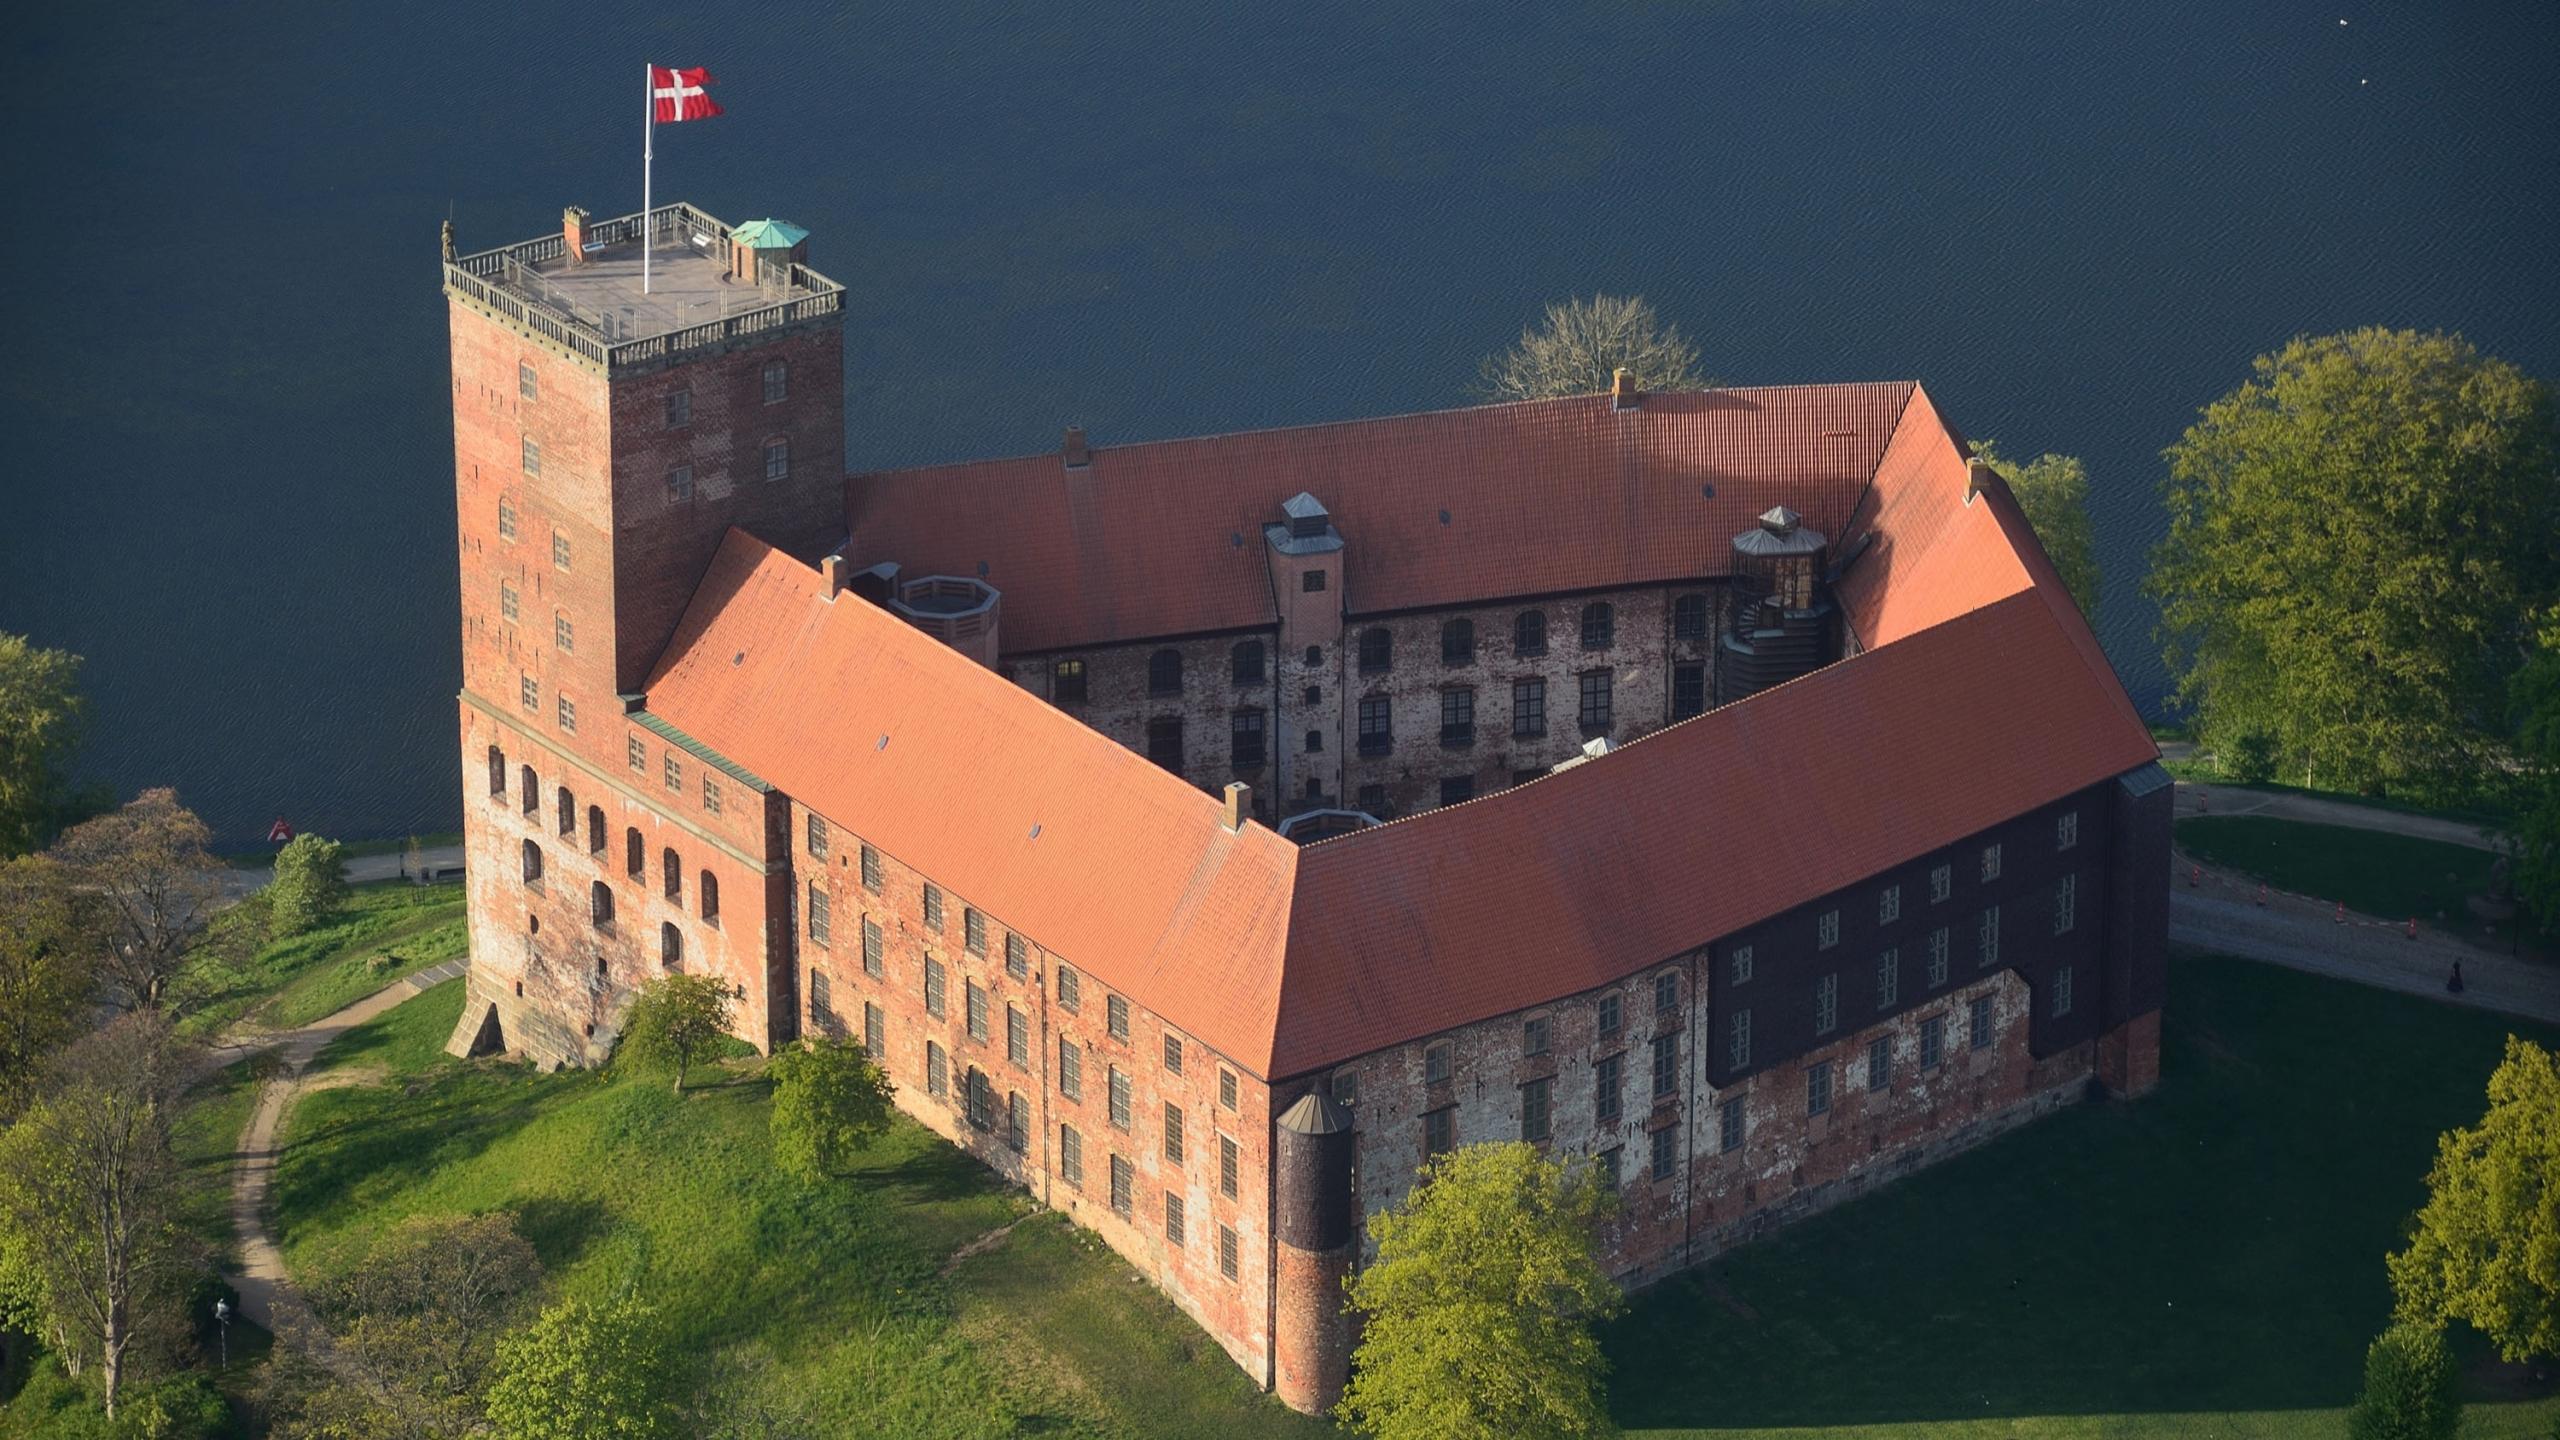 Museet på Koldinghus